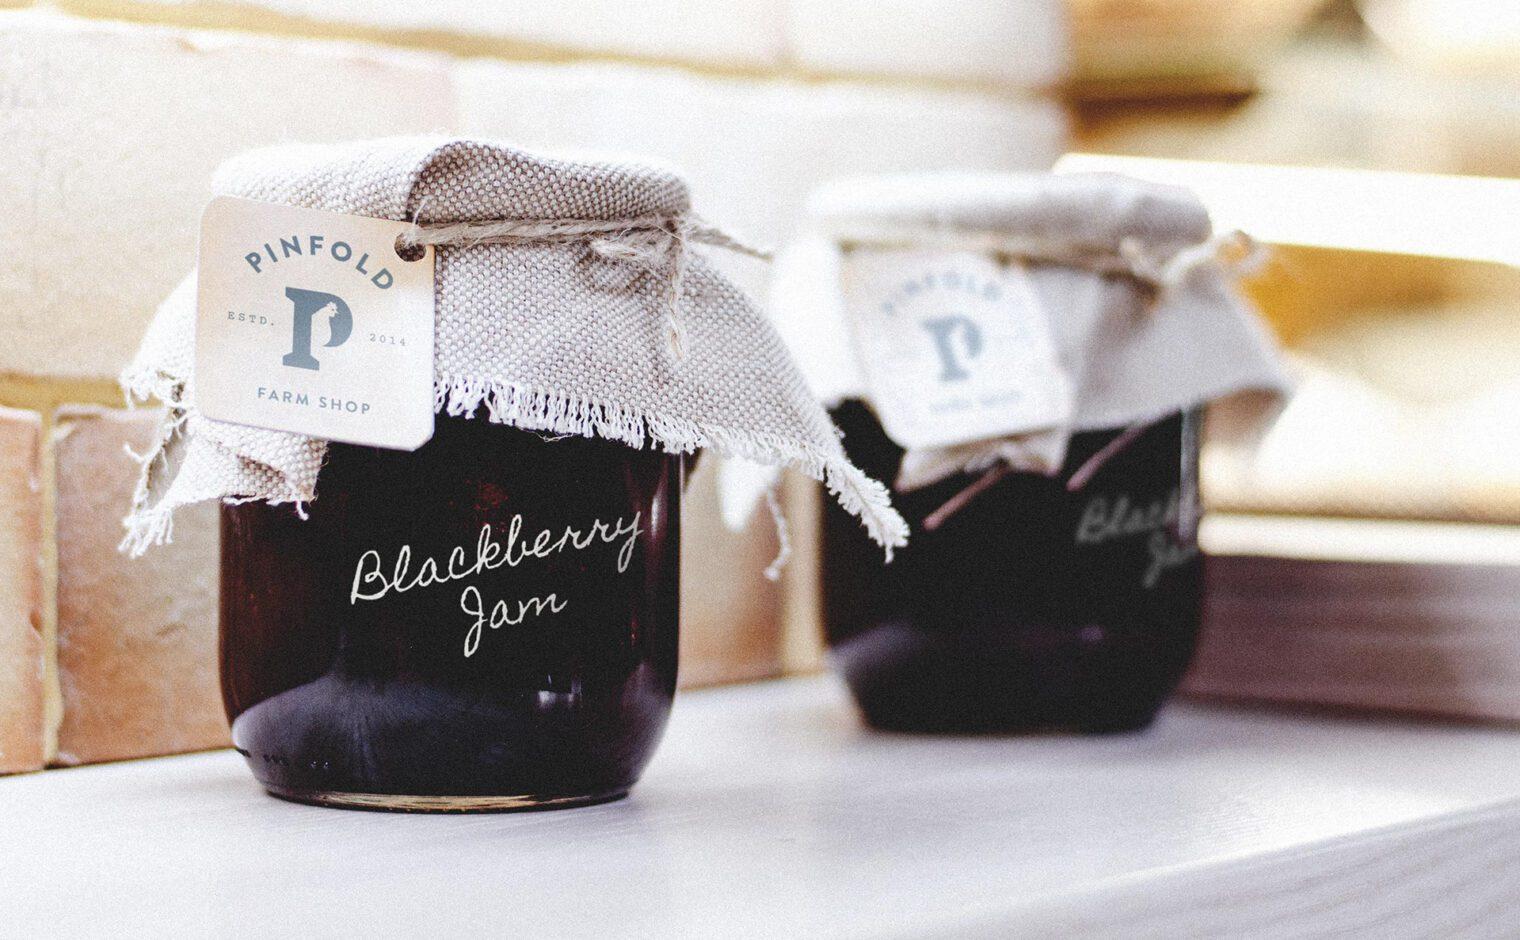 Pinfold Farm Shop homemade blackberry jam packaging